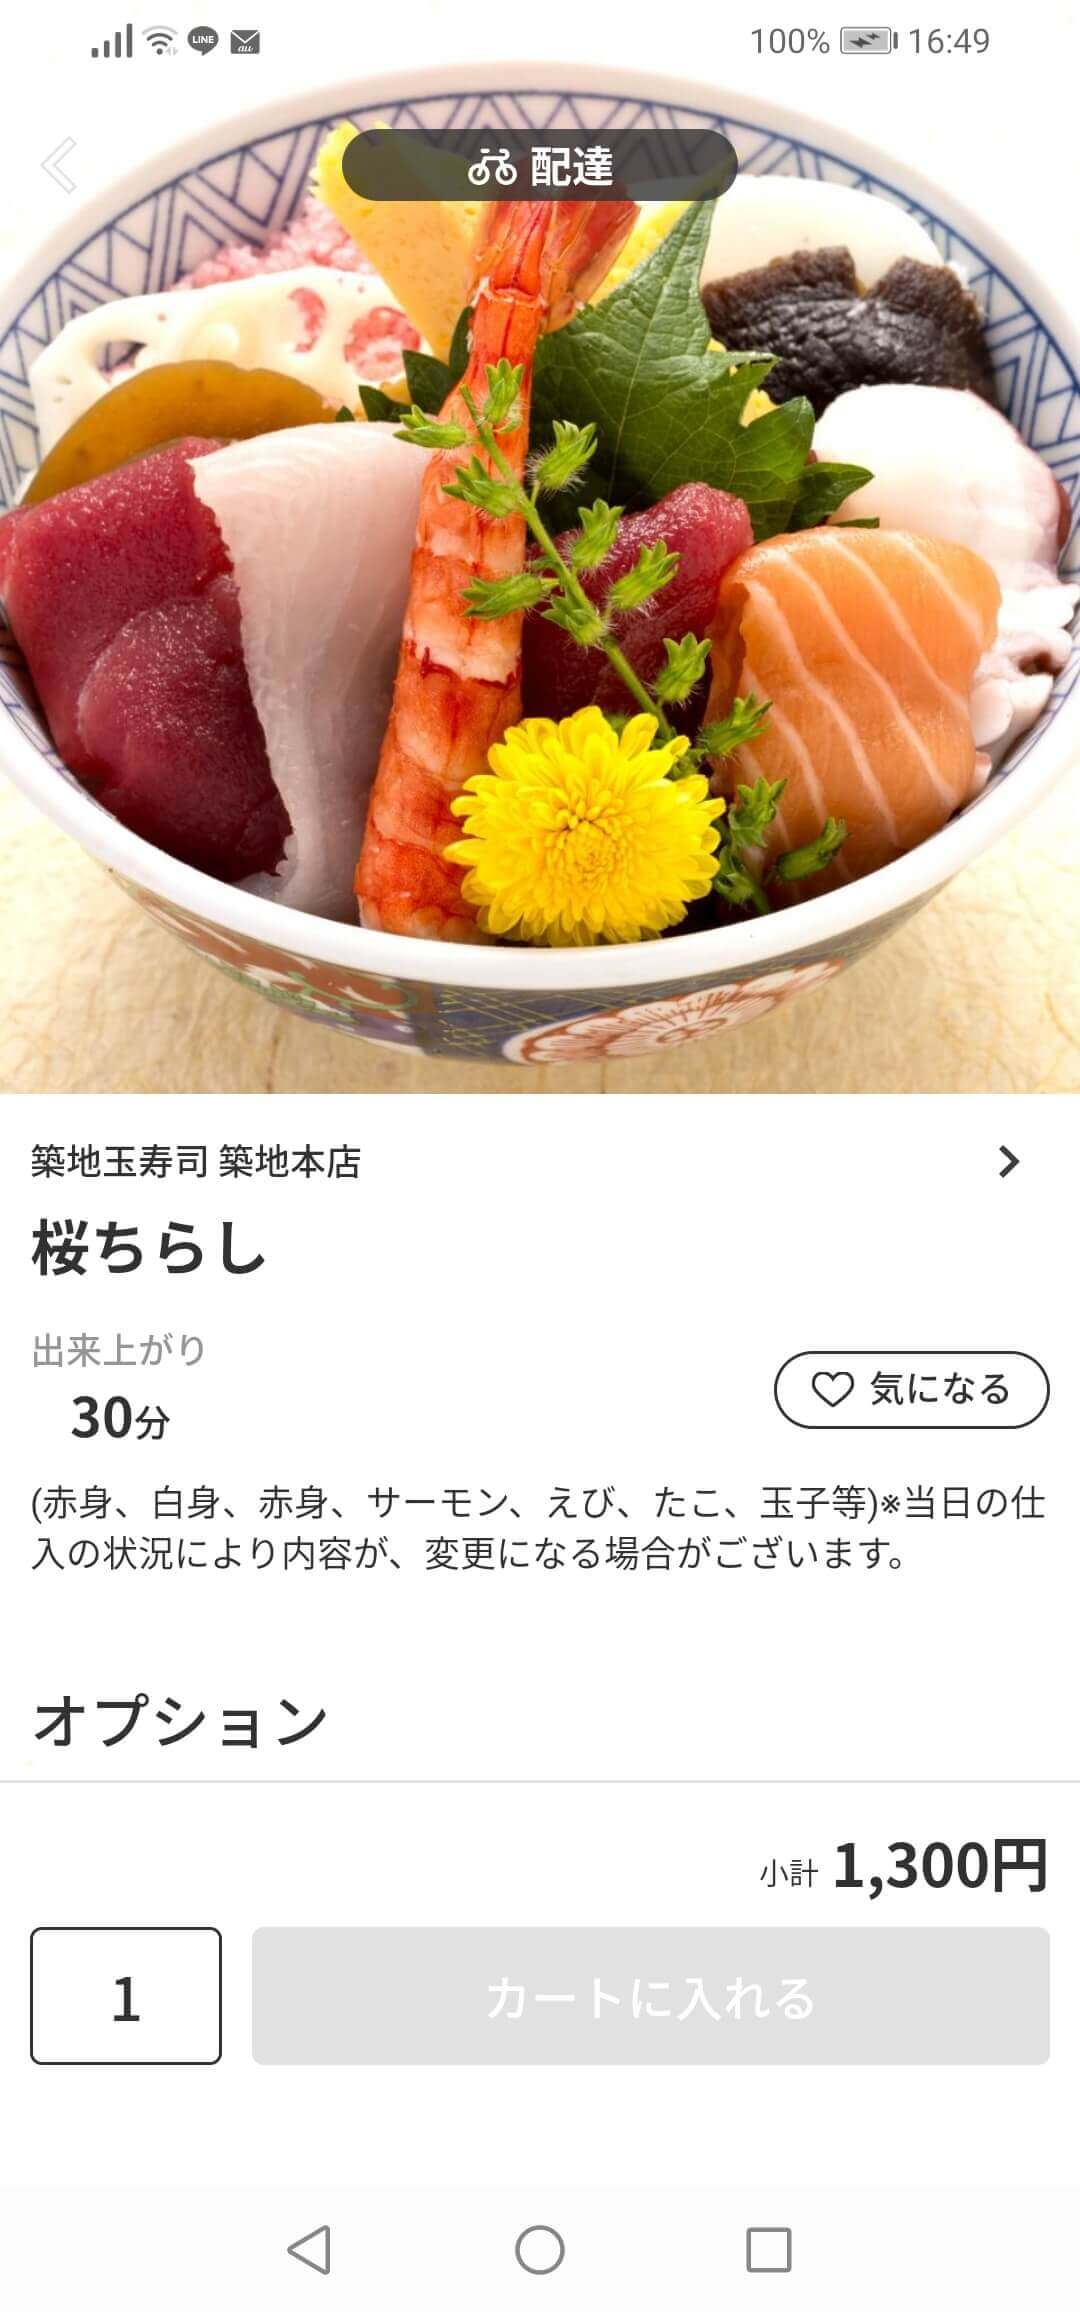 menu(メニュー)東京都内のおすすめ店舗・寿司/丼もの【築地玉寿司 築地本店】『桜ちらし』1,300円